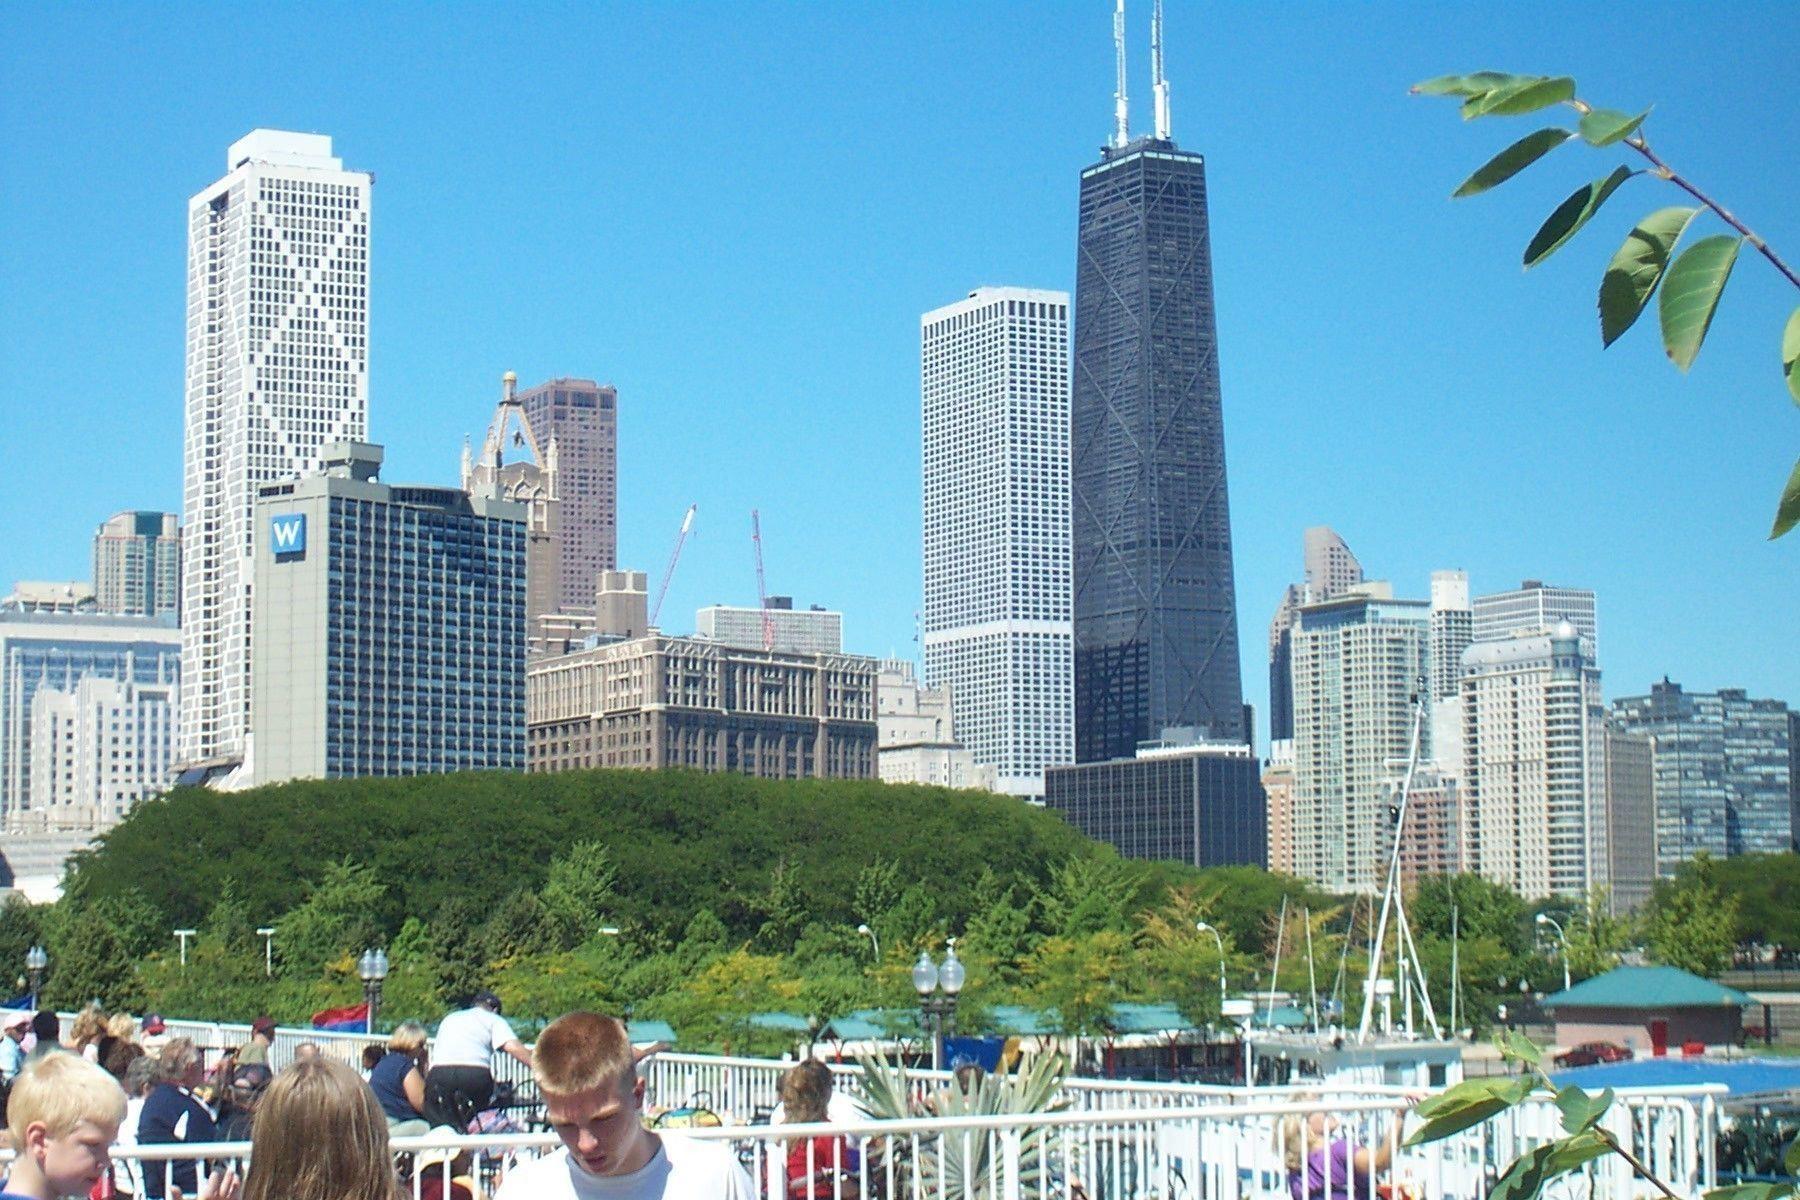 Jeff's tour of chicago